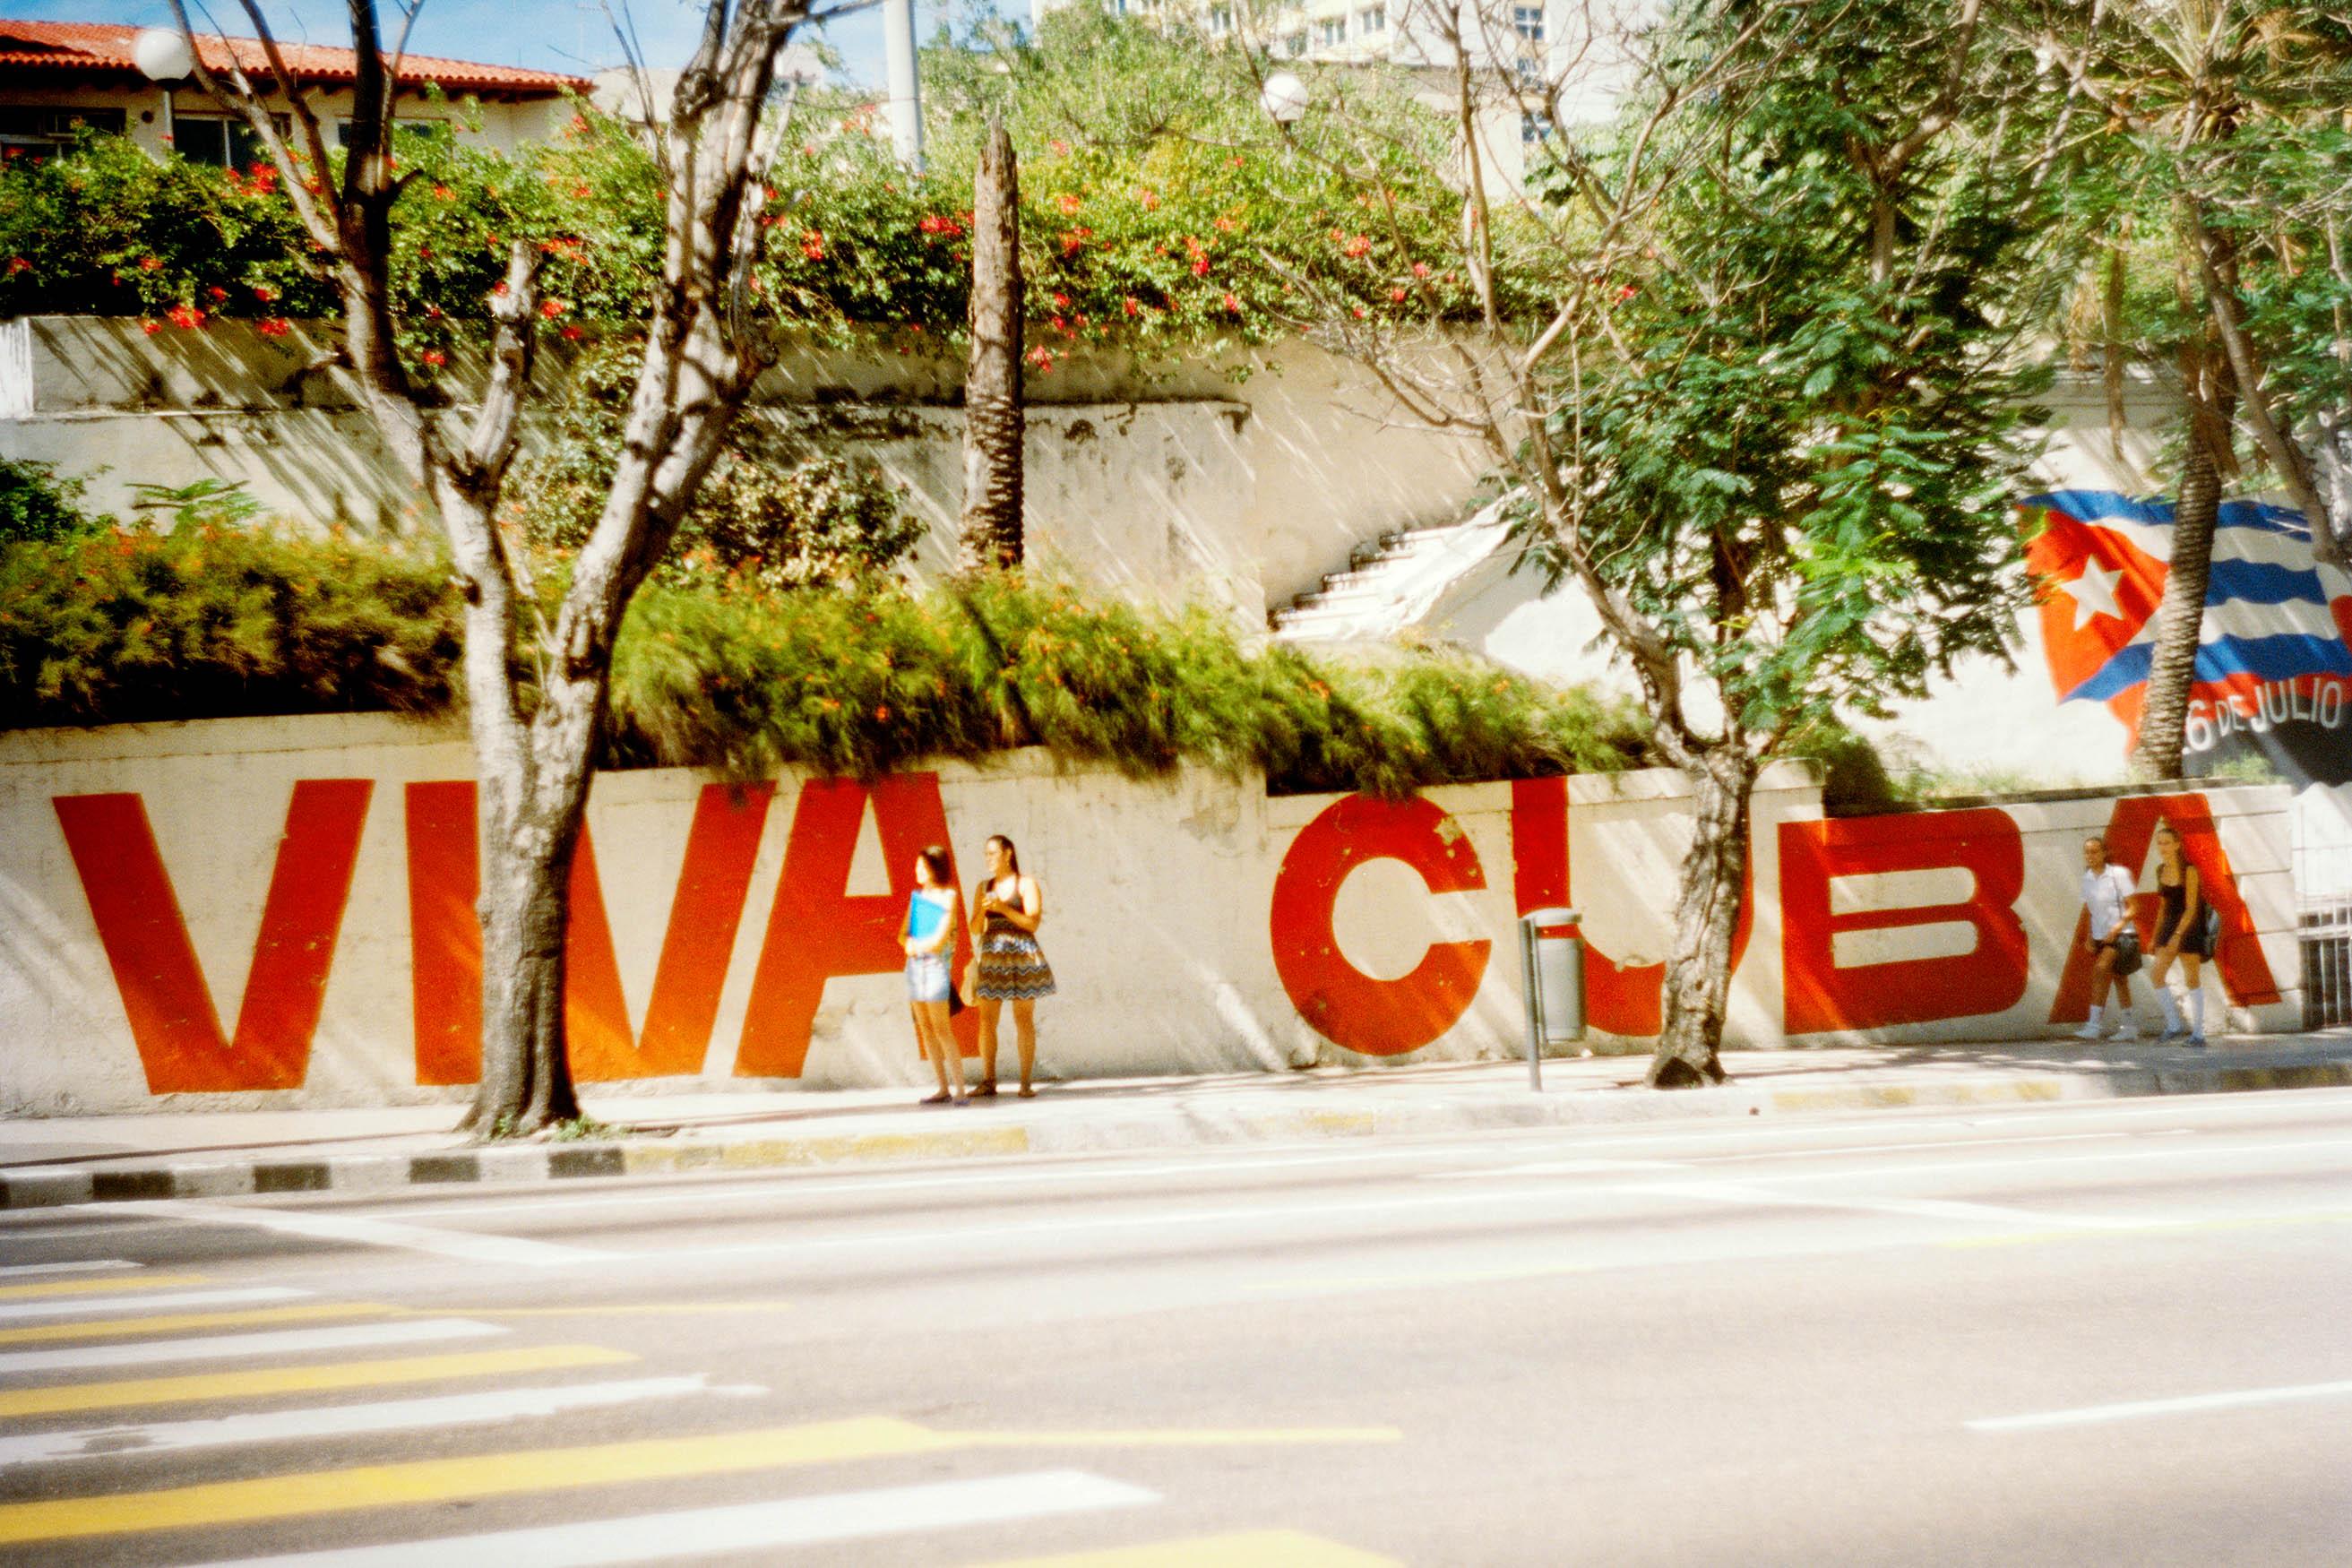 havana-club-cuba-imagery-23